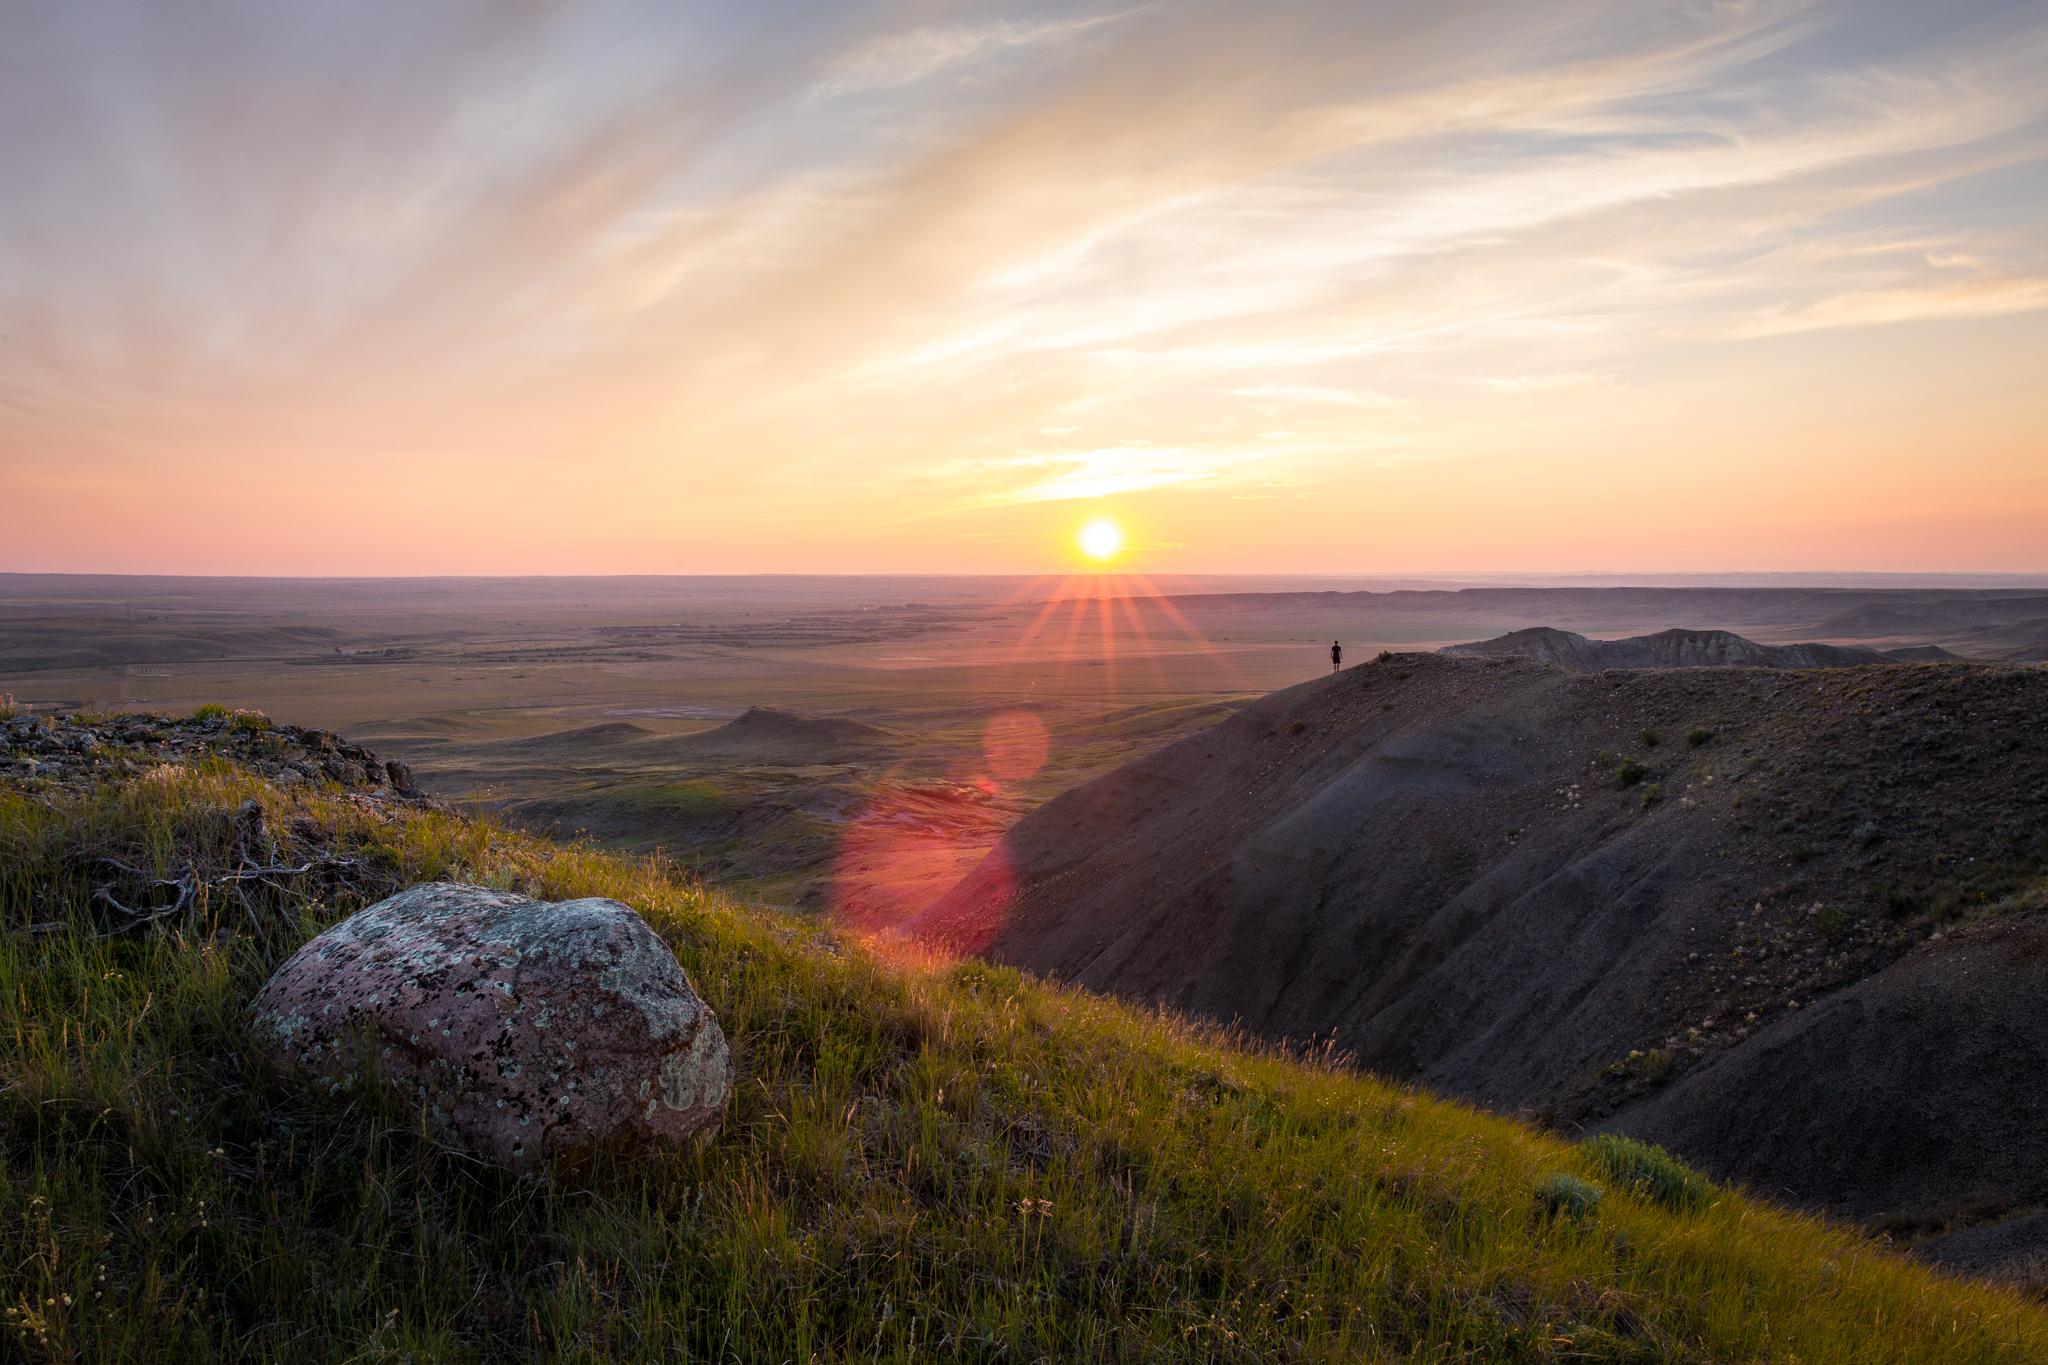 Grassland National Park. 70 Mile Butte trail.